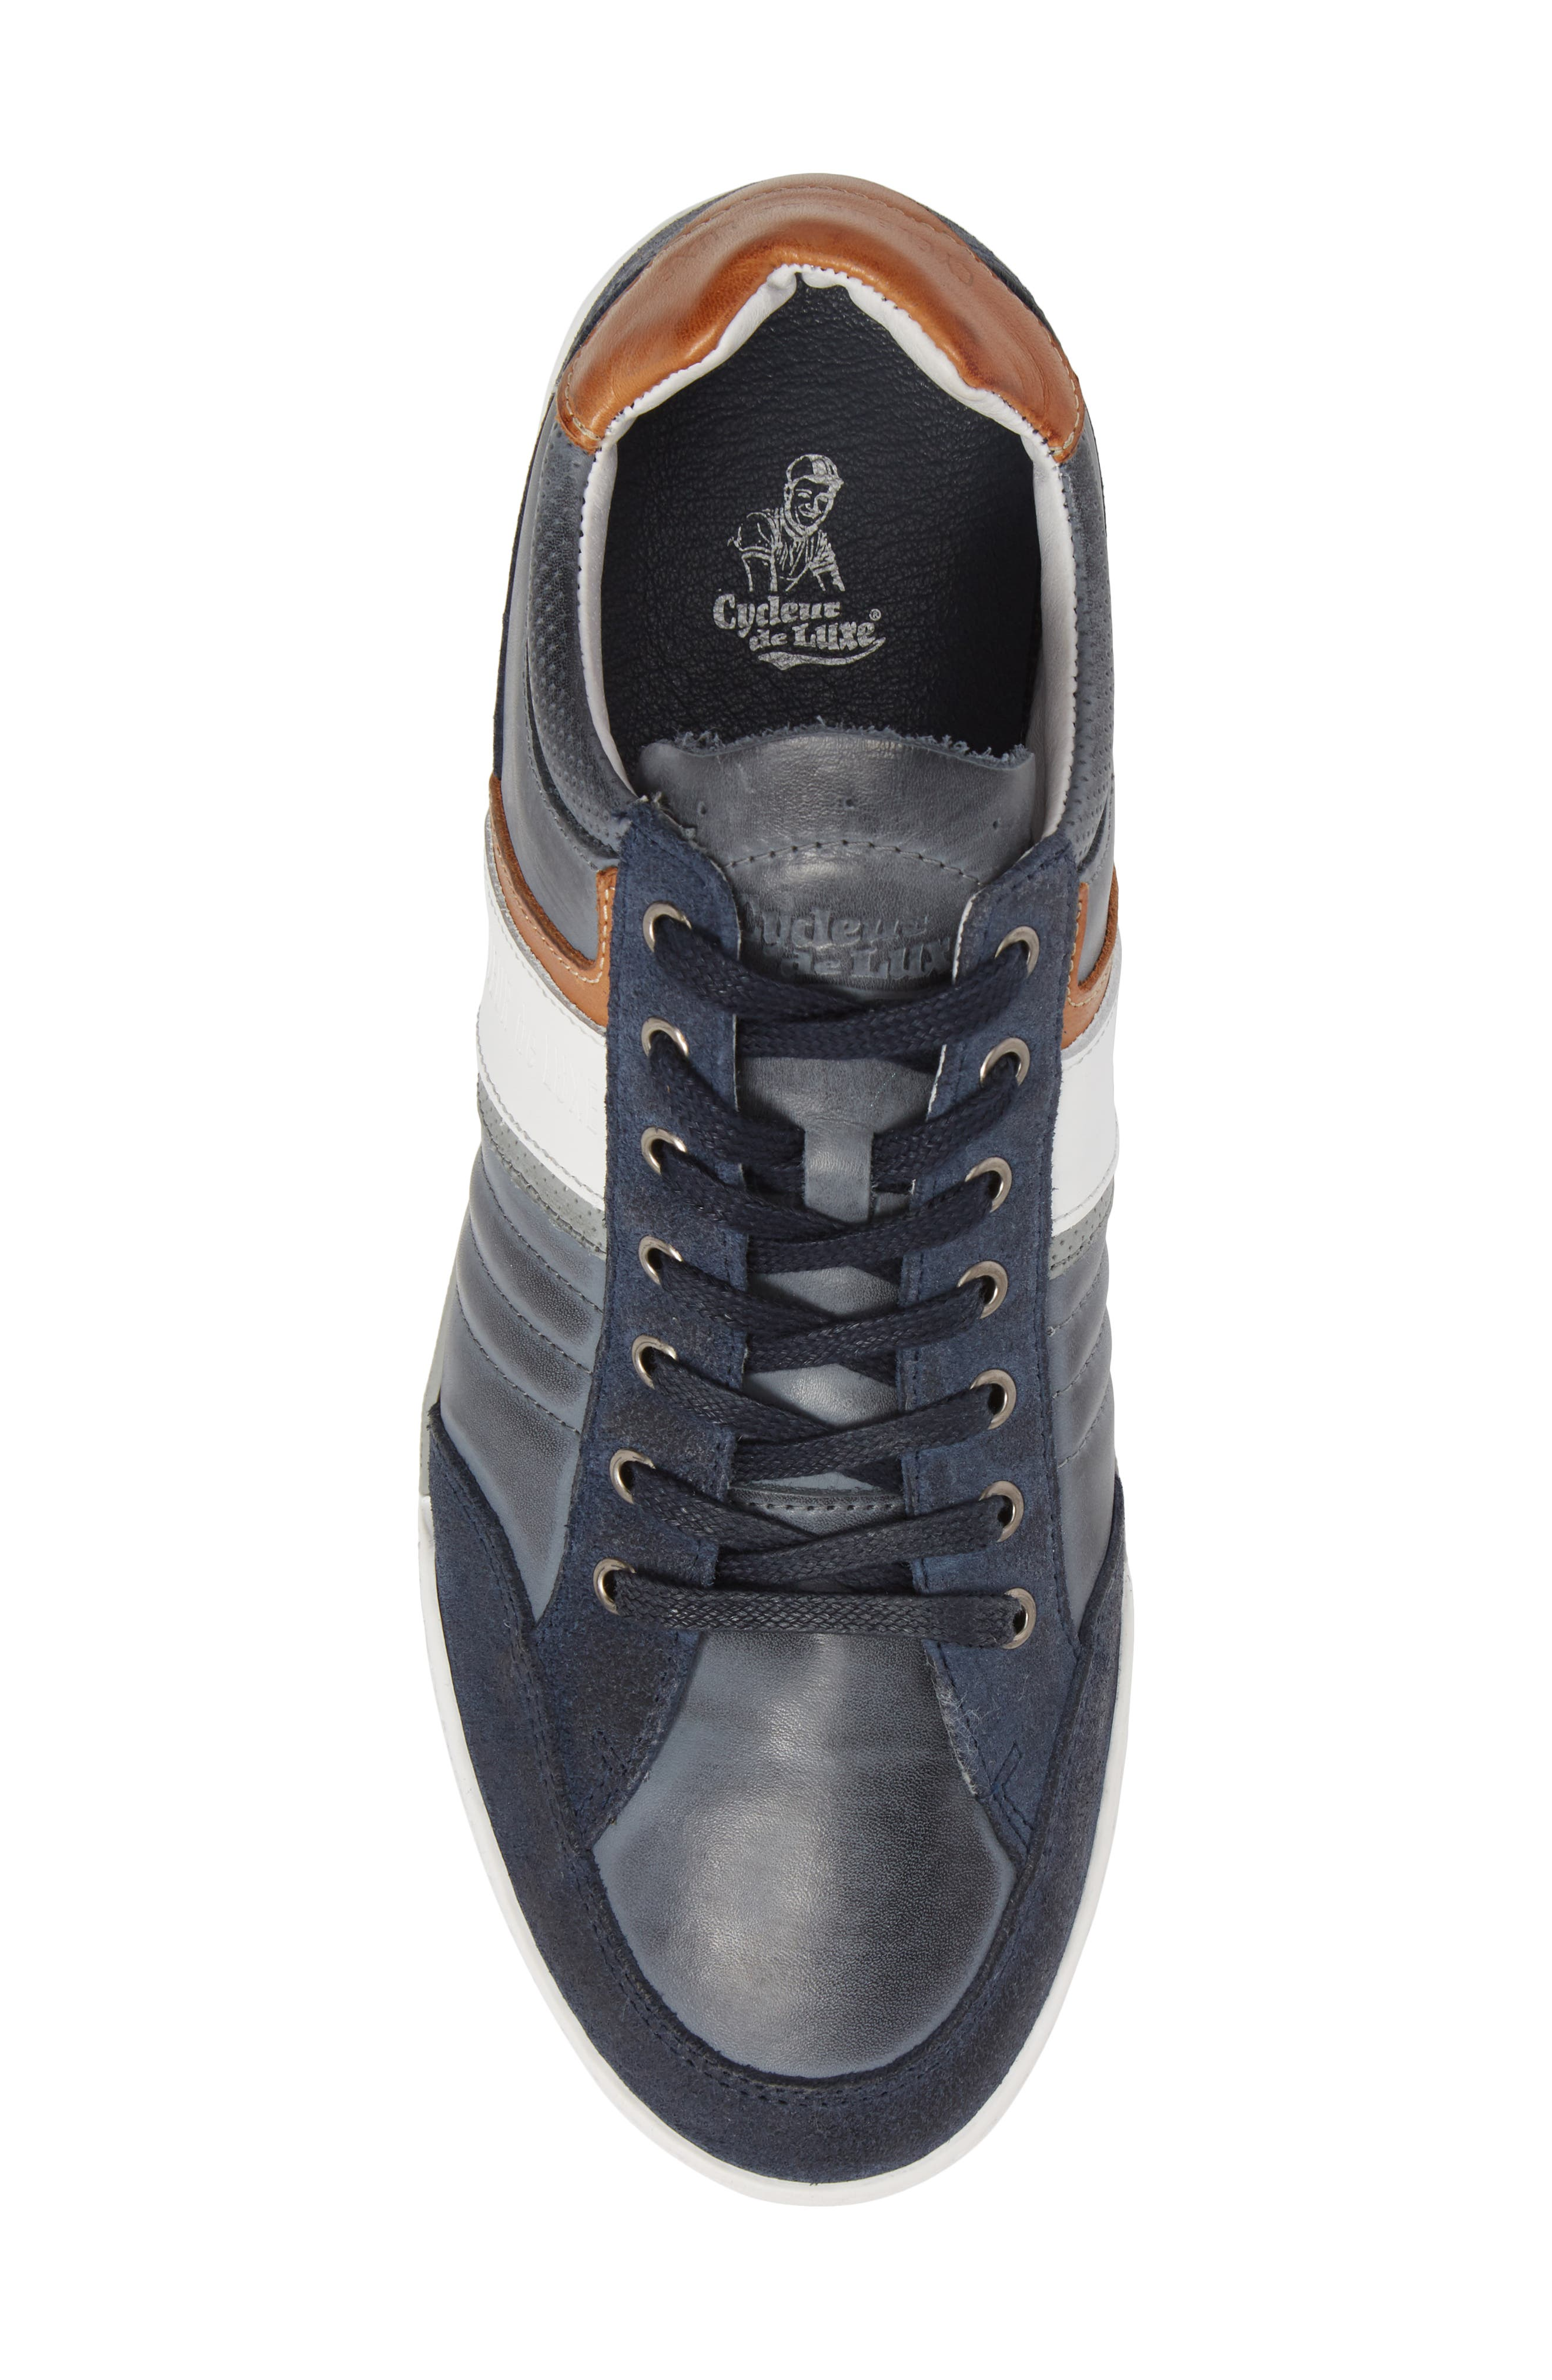 Solo Low Top Sneaker,                             Alternate thumbnail 5, color,                             Denim/ White/ Cognac Leather